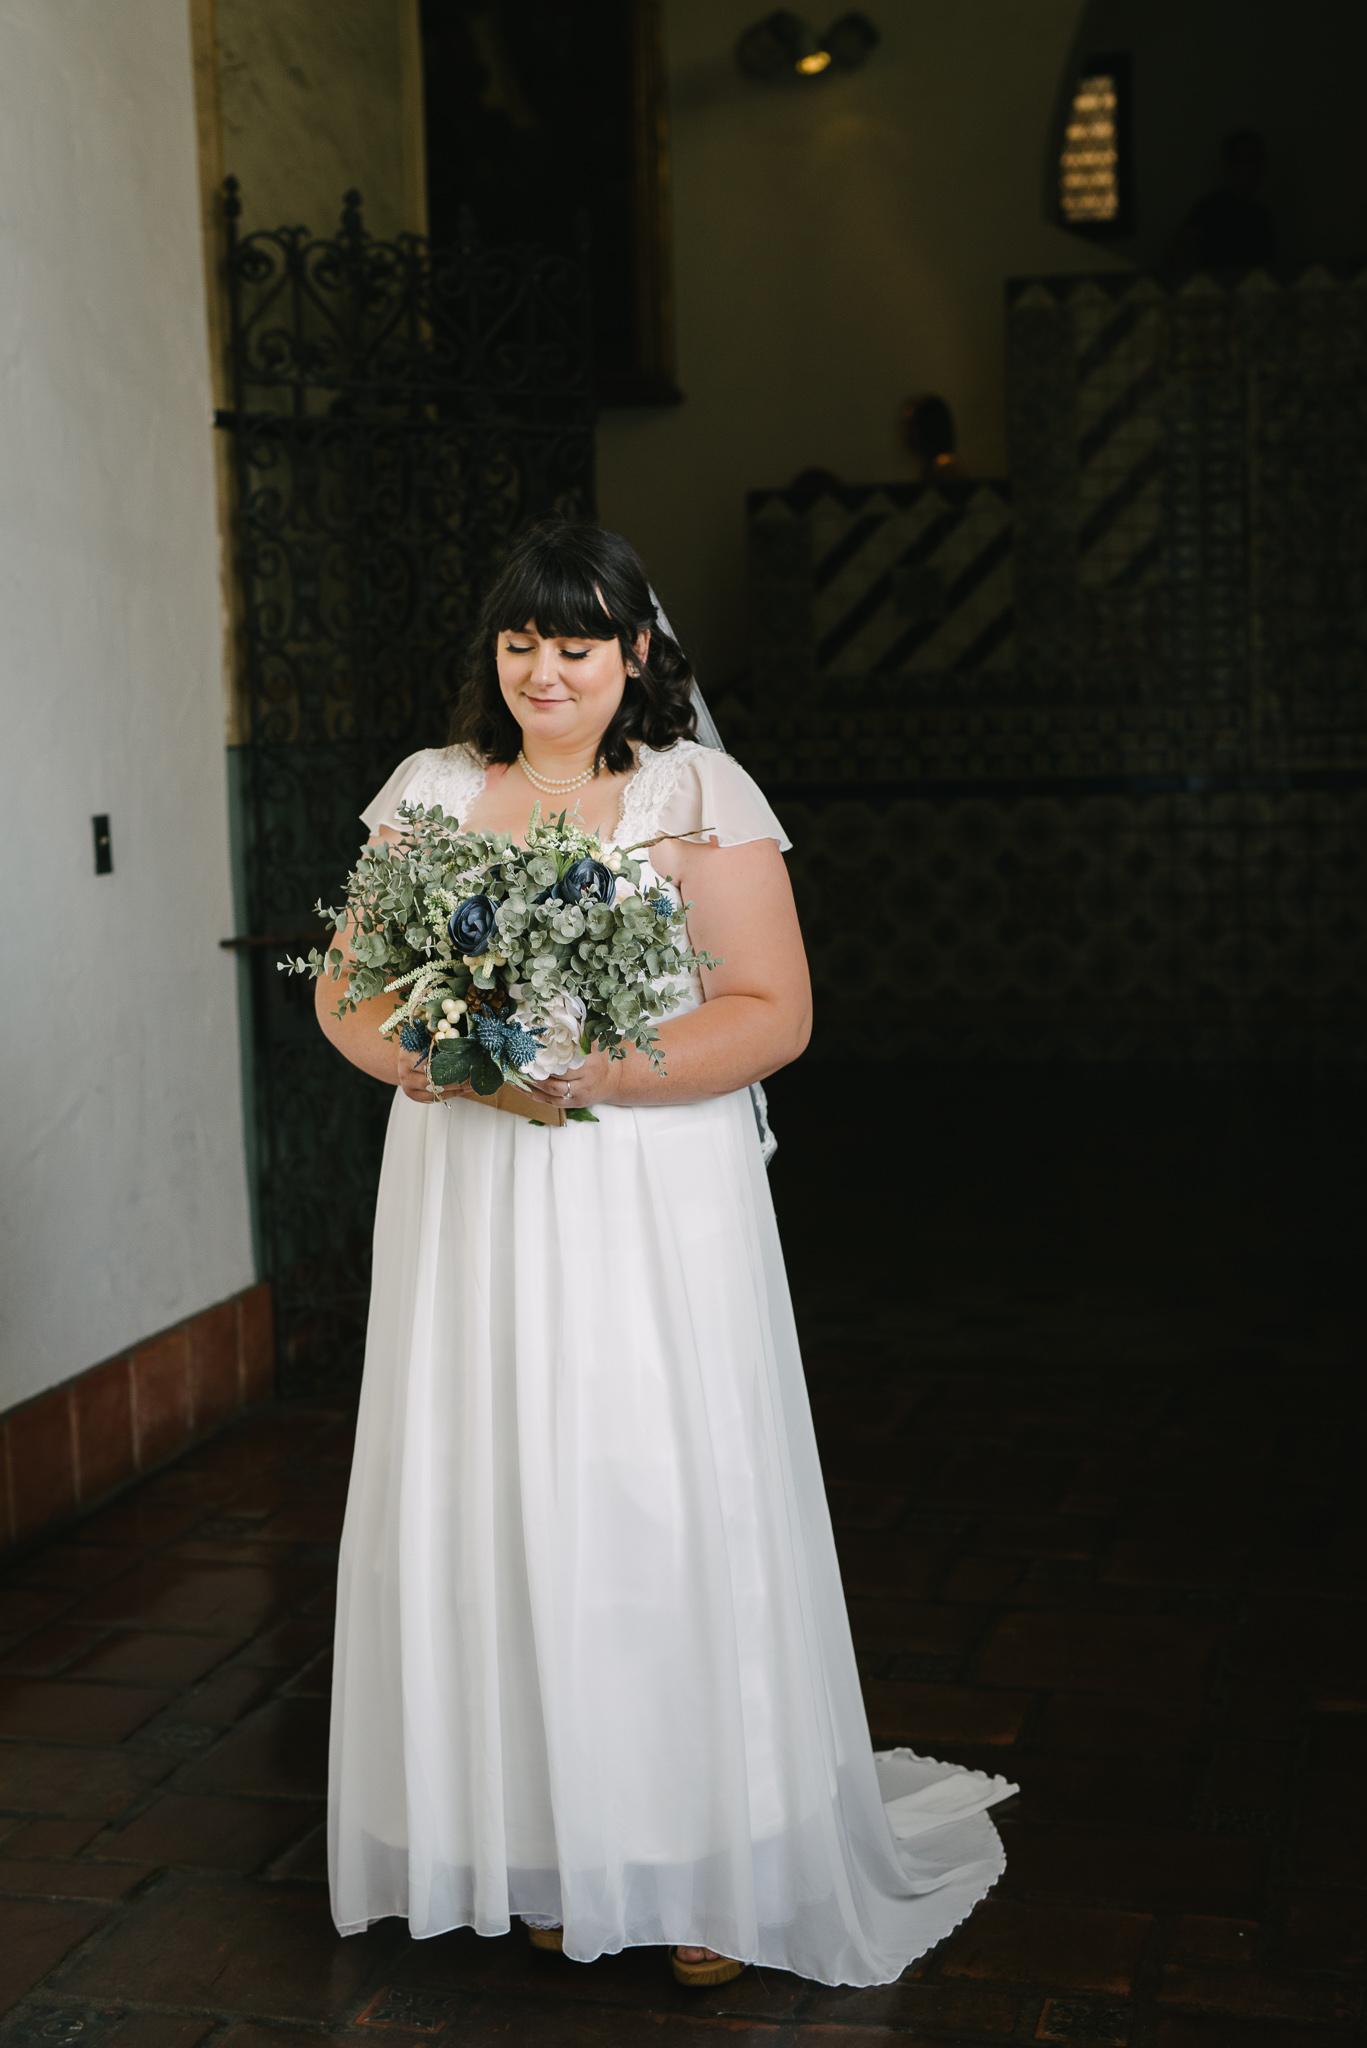 santabarbaracourthousewedding-1.jpg